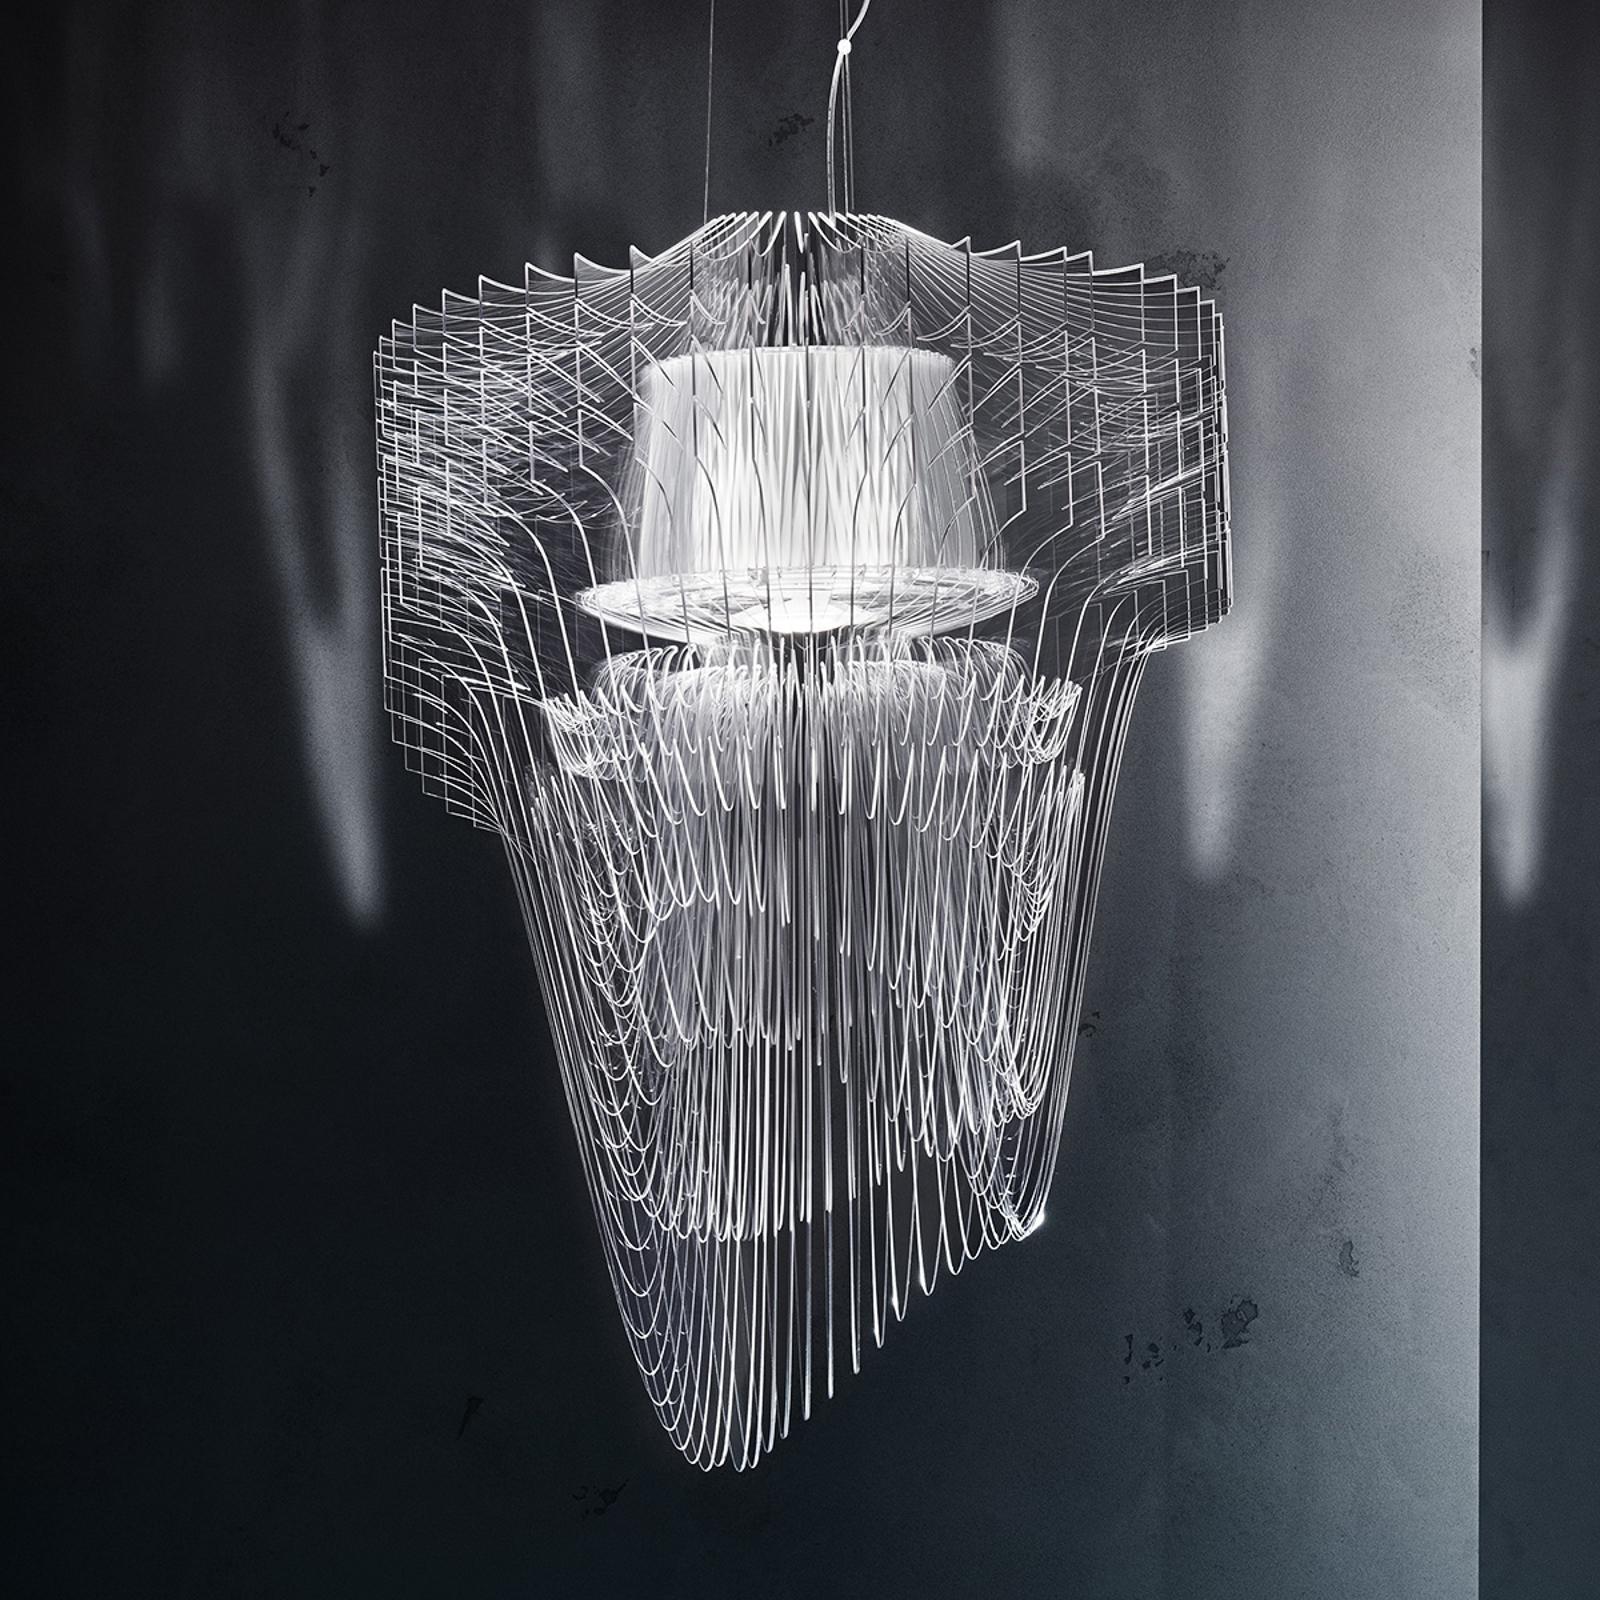 Runsas design-LED-riippuvalaisin Aria, 90 cm